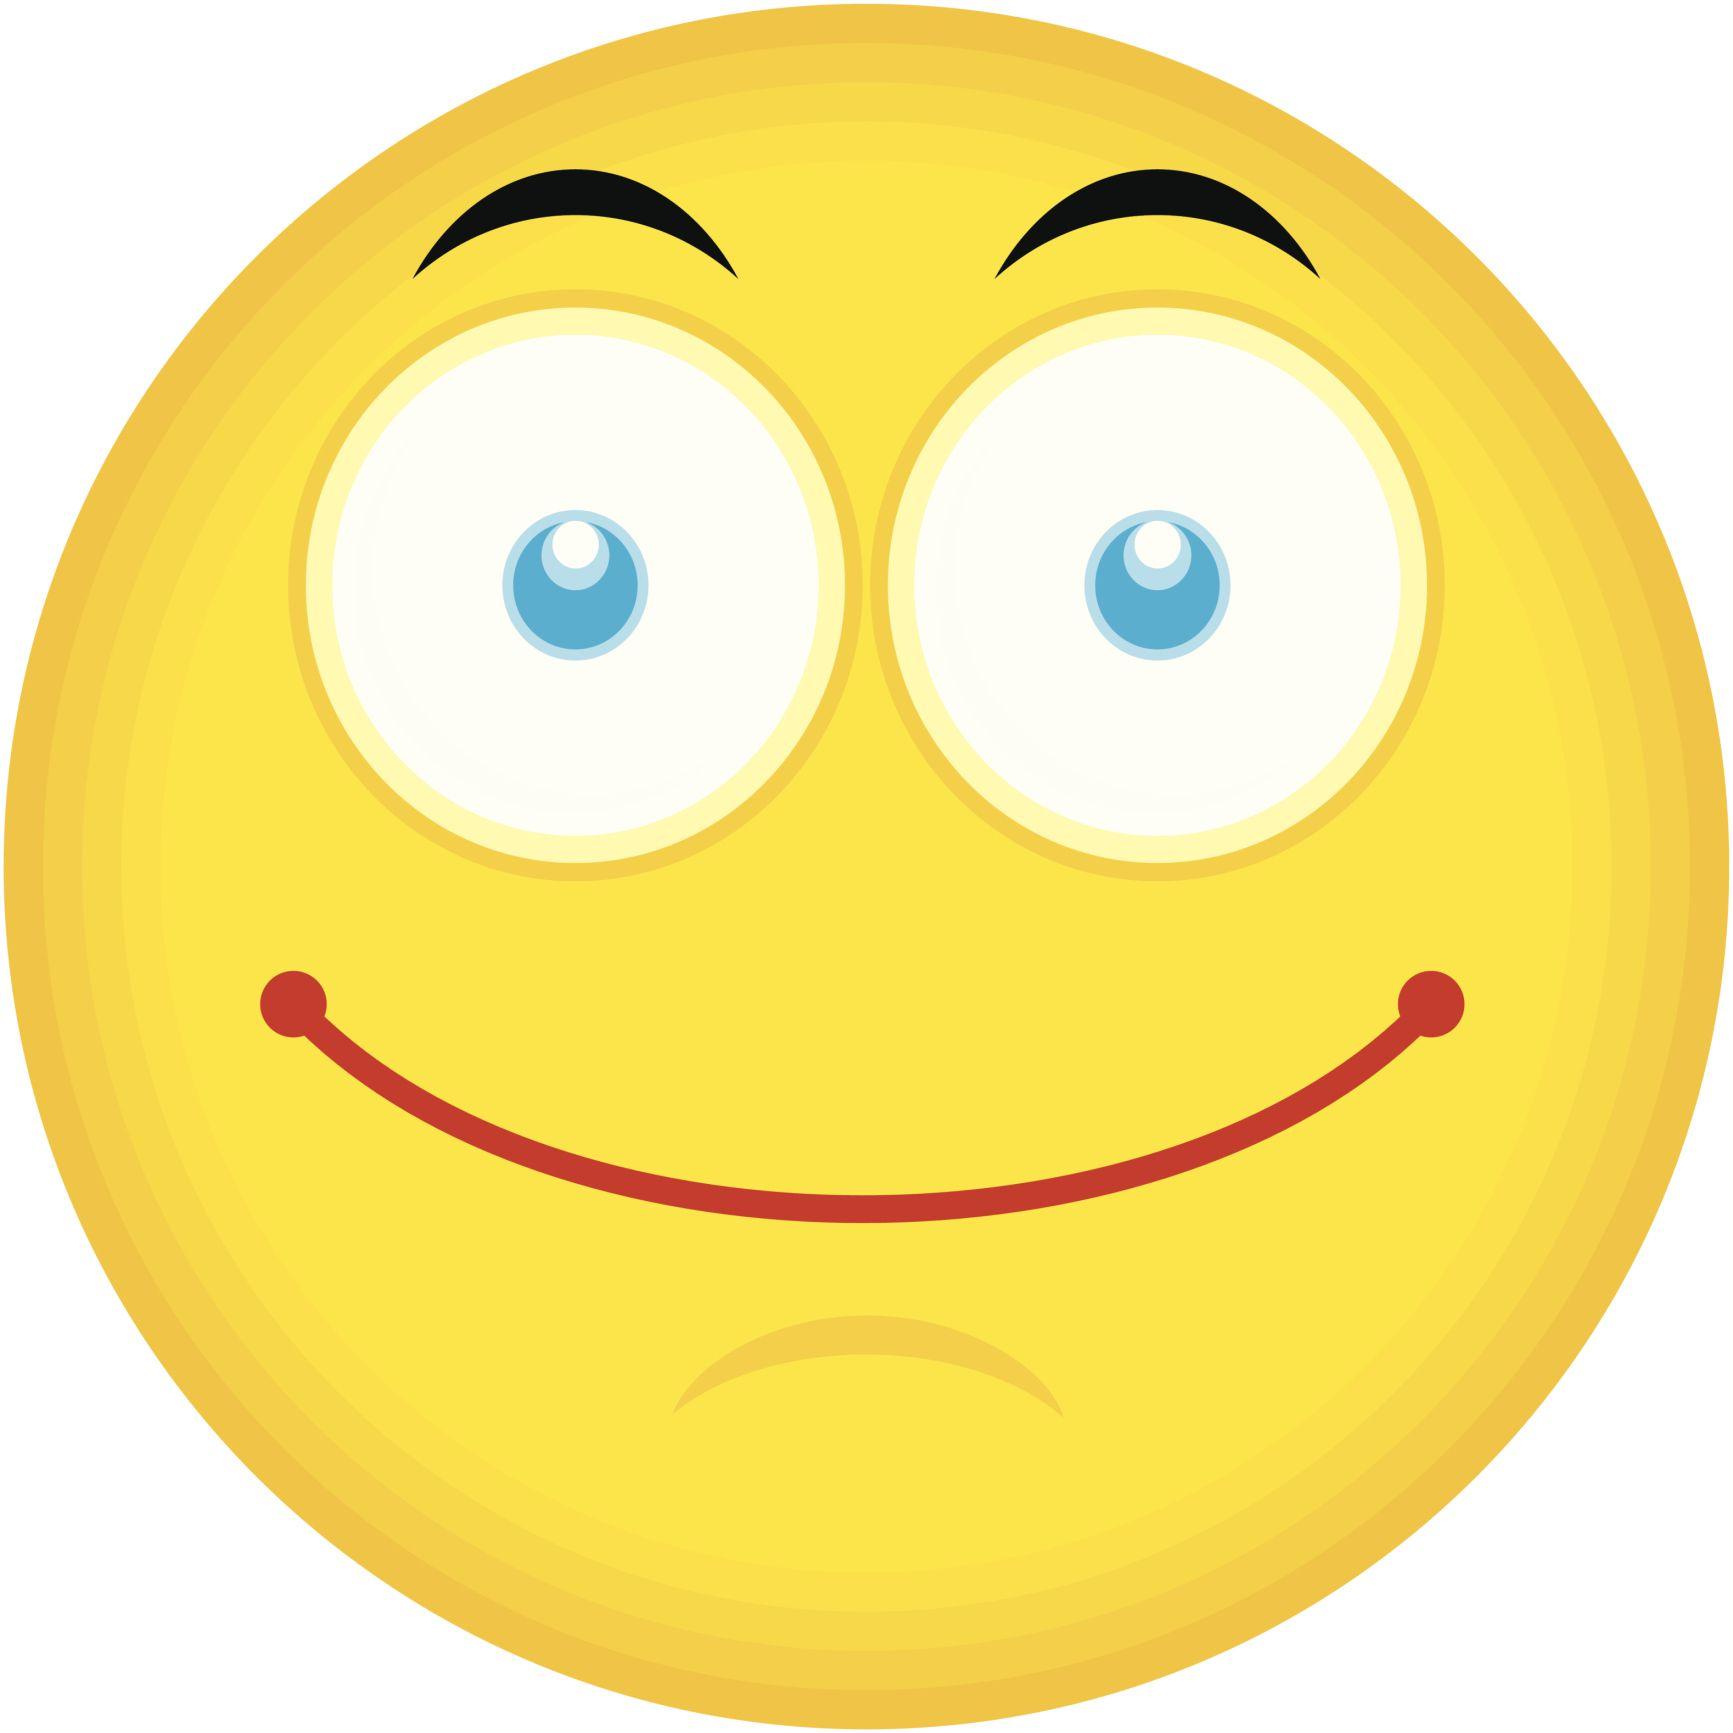 History Of Emoticons And Emoji